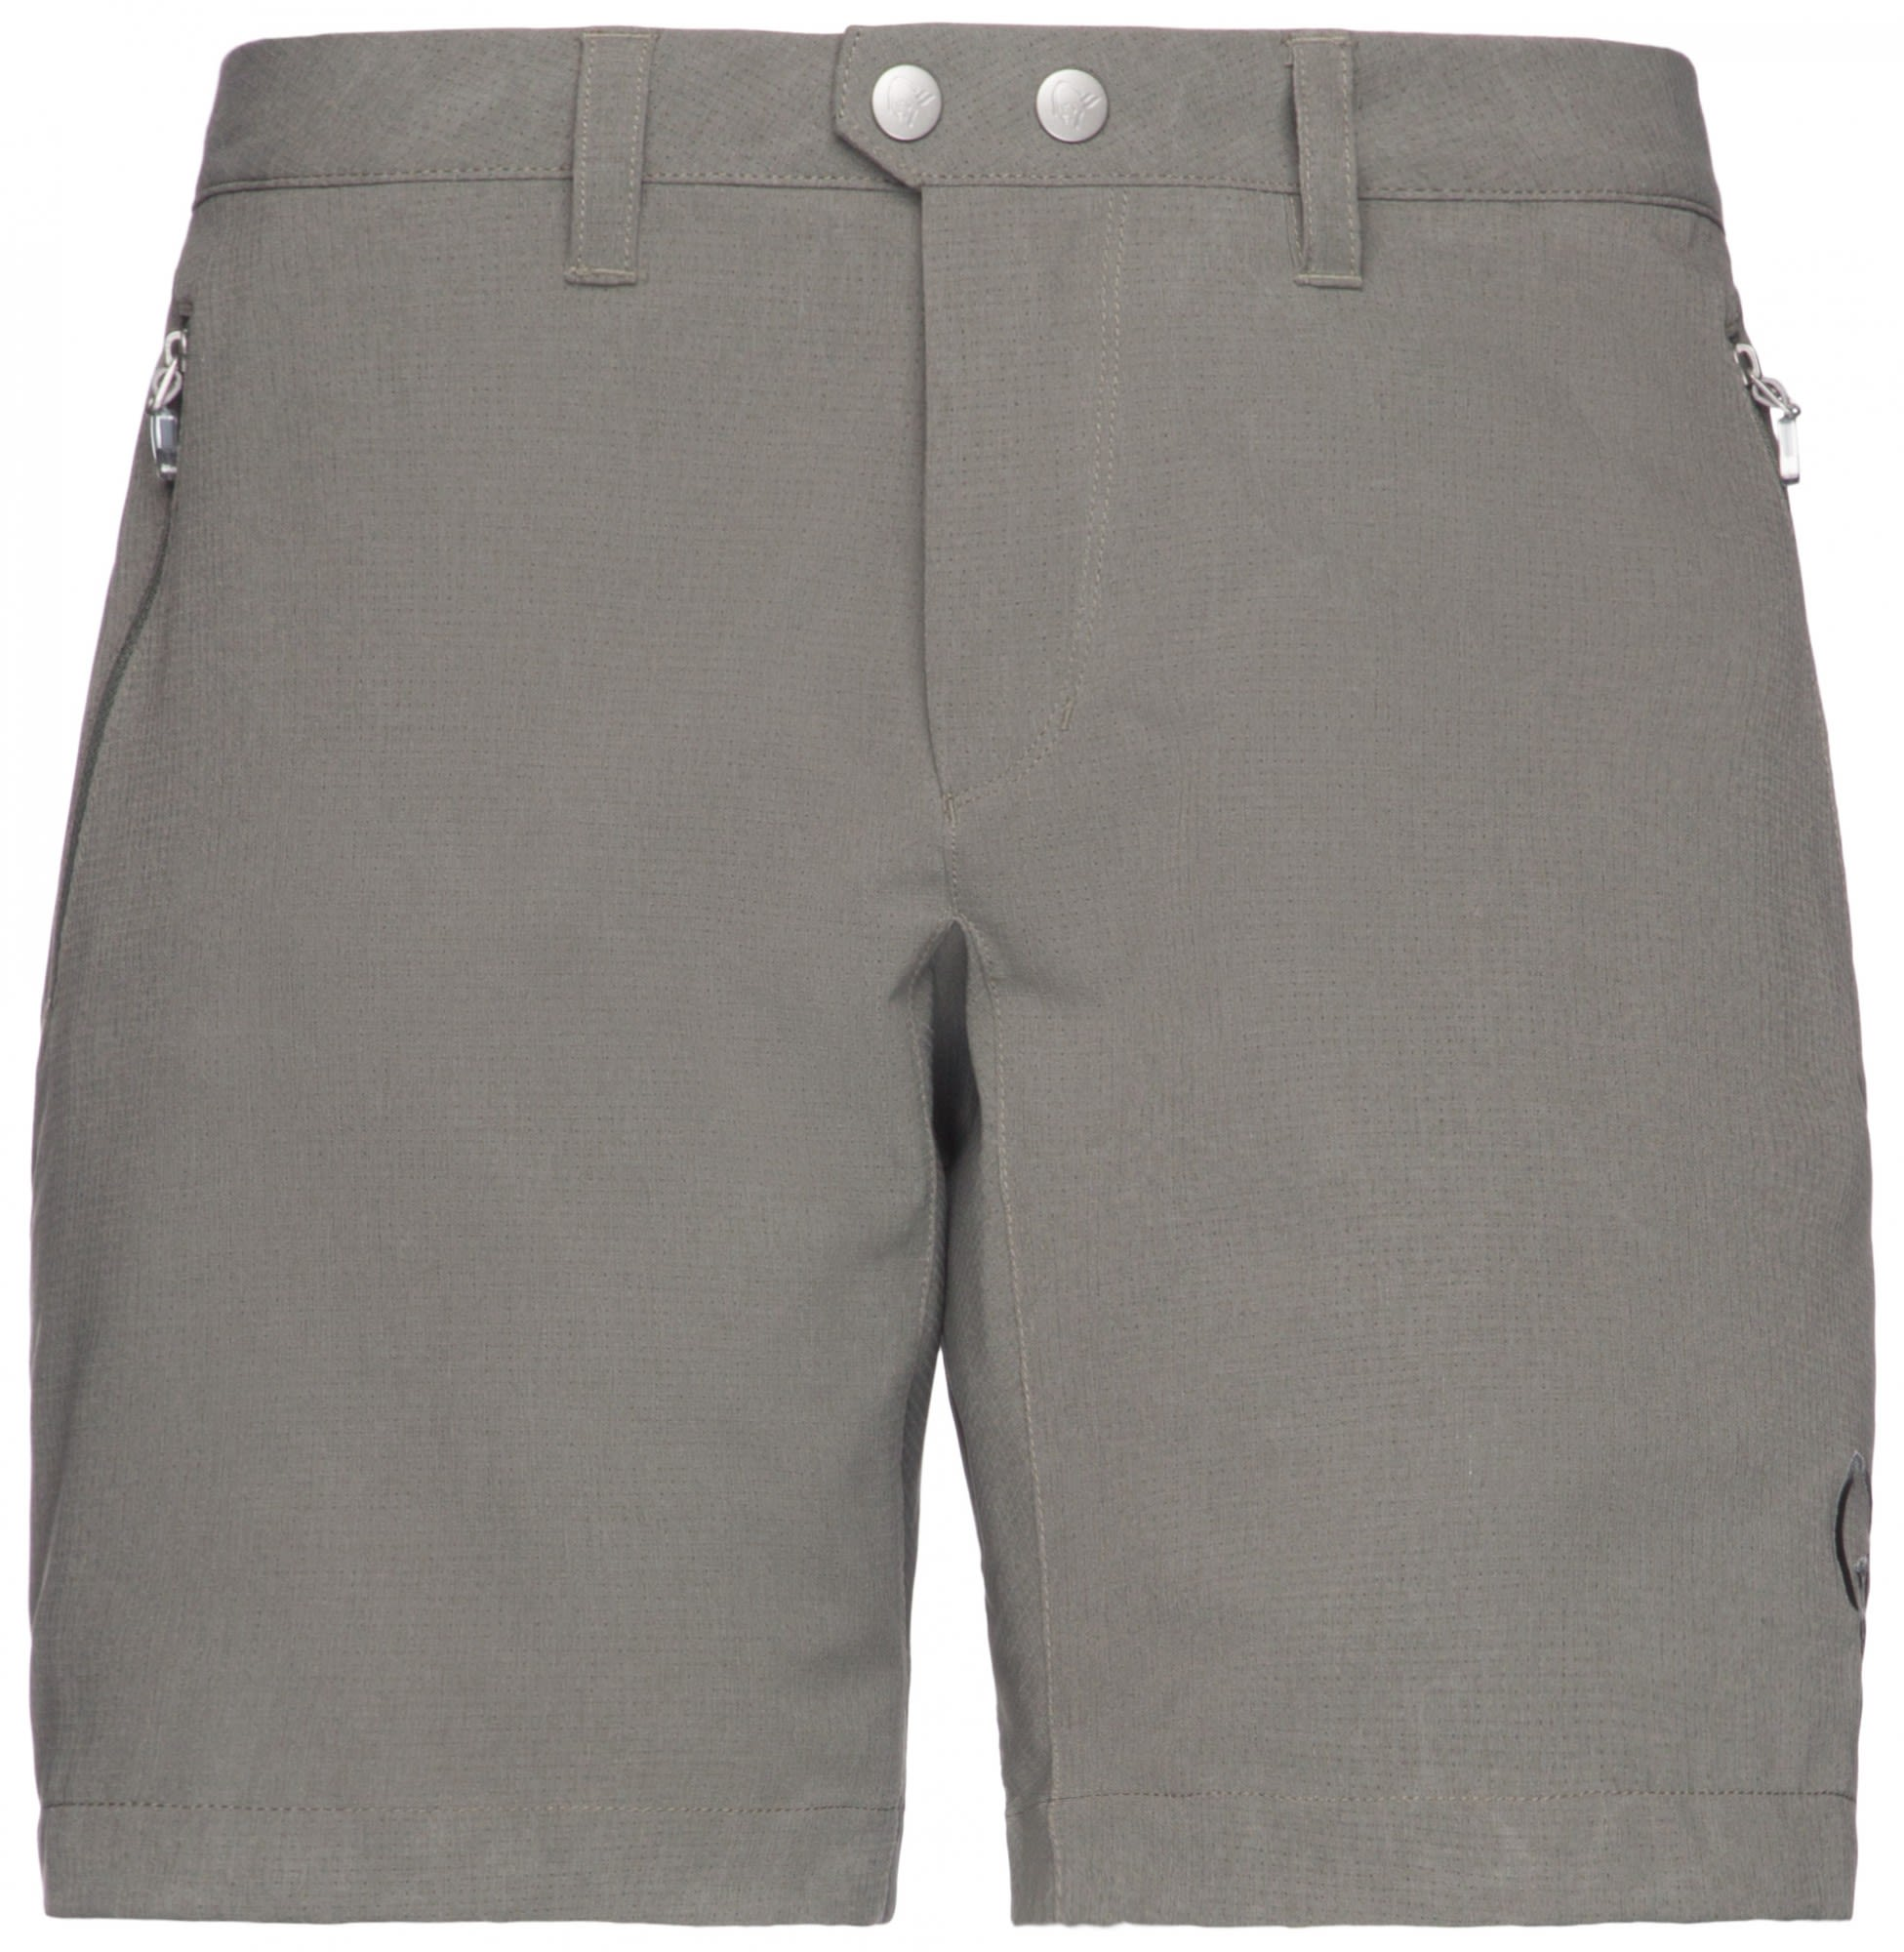 Norrona Bitihorn Flex1 Shorts Grau, Female Shorts, M